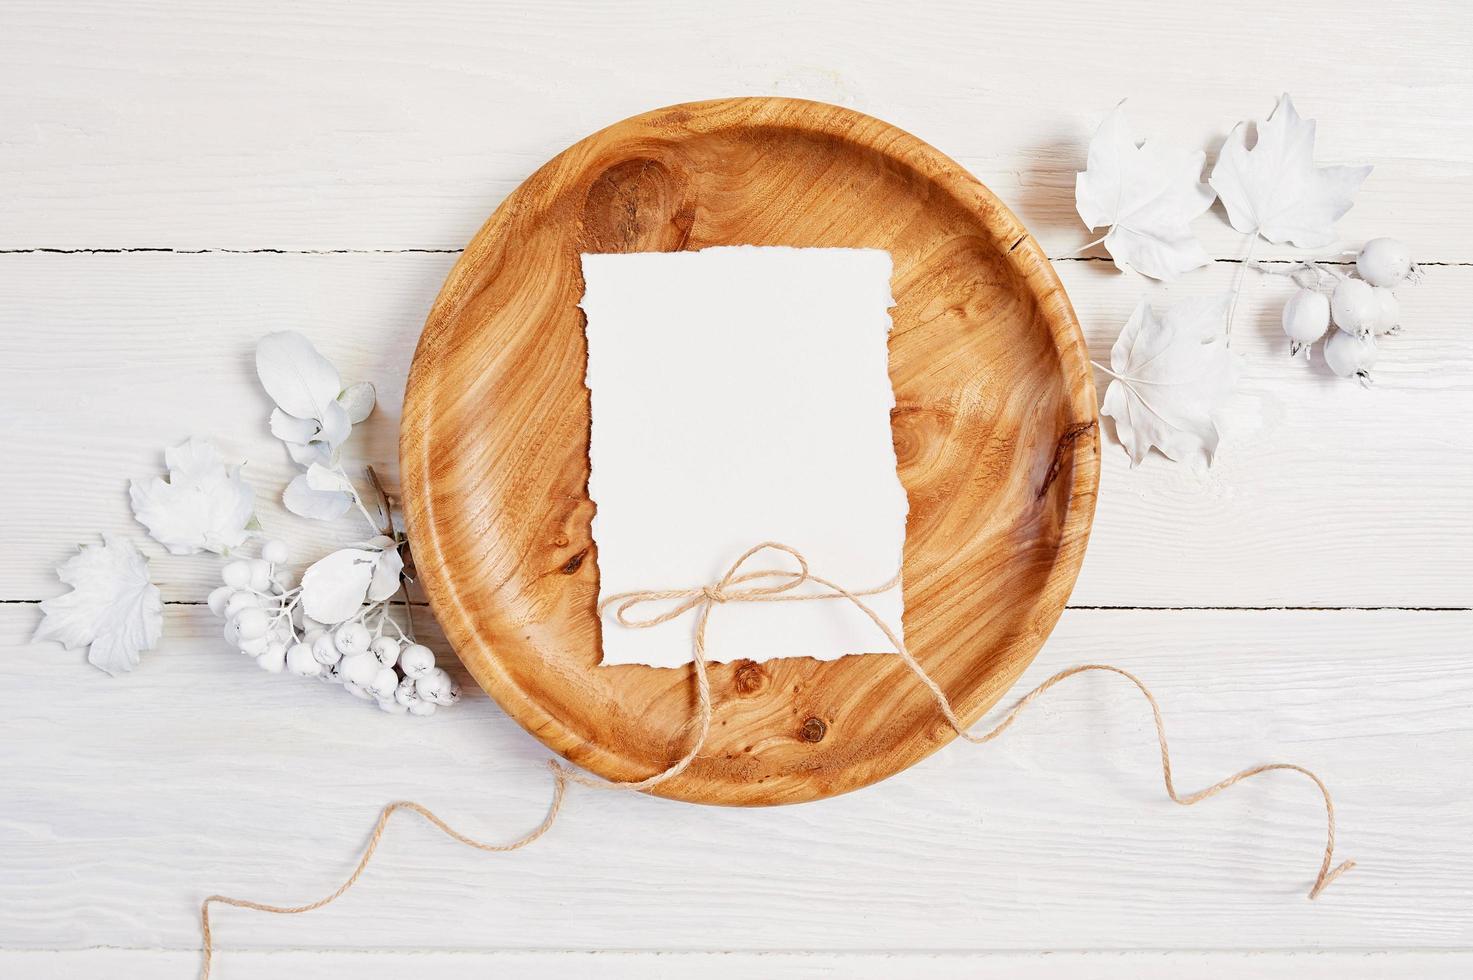 tomt papper i träskål på träbord foto